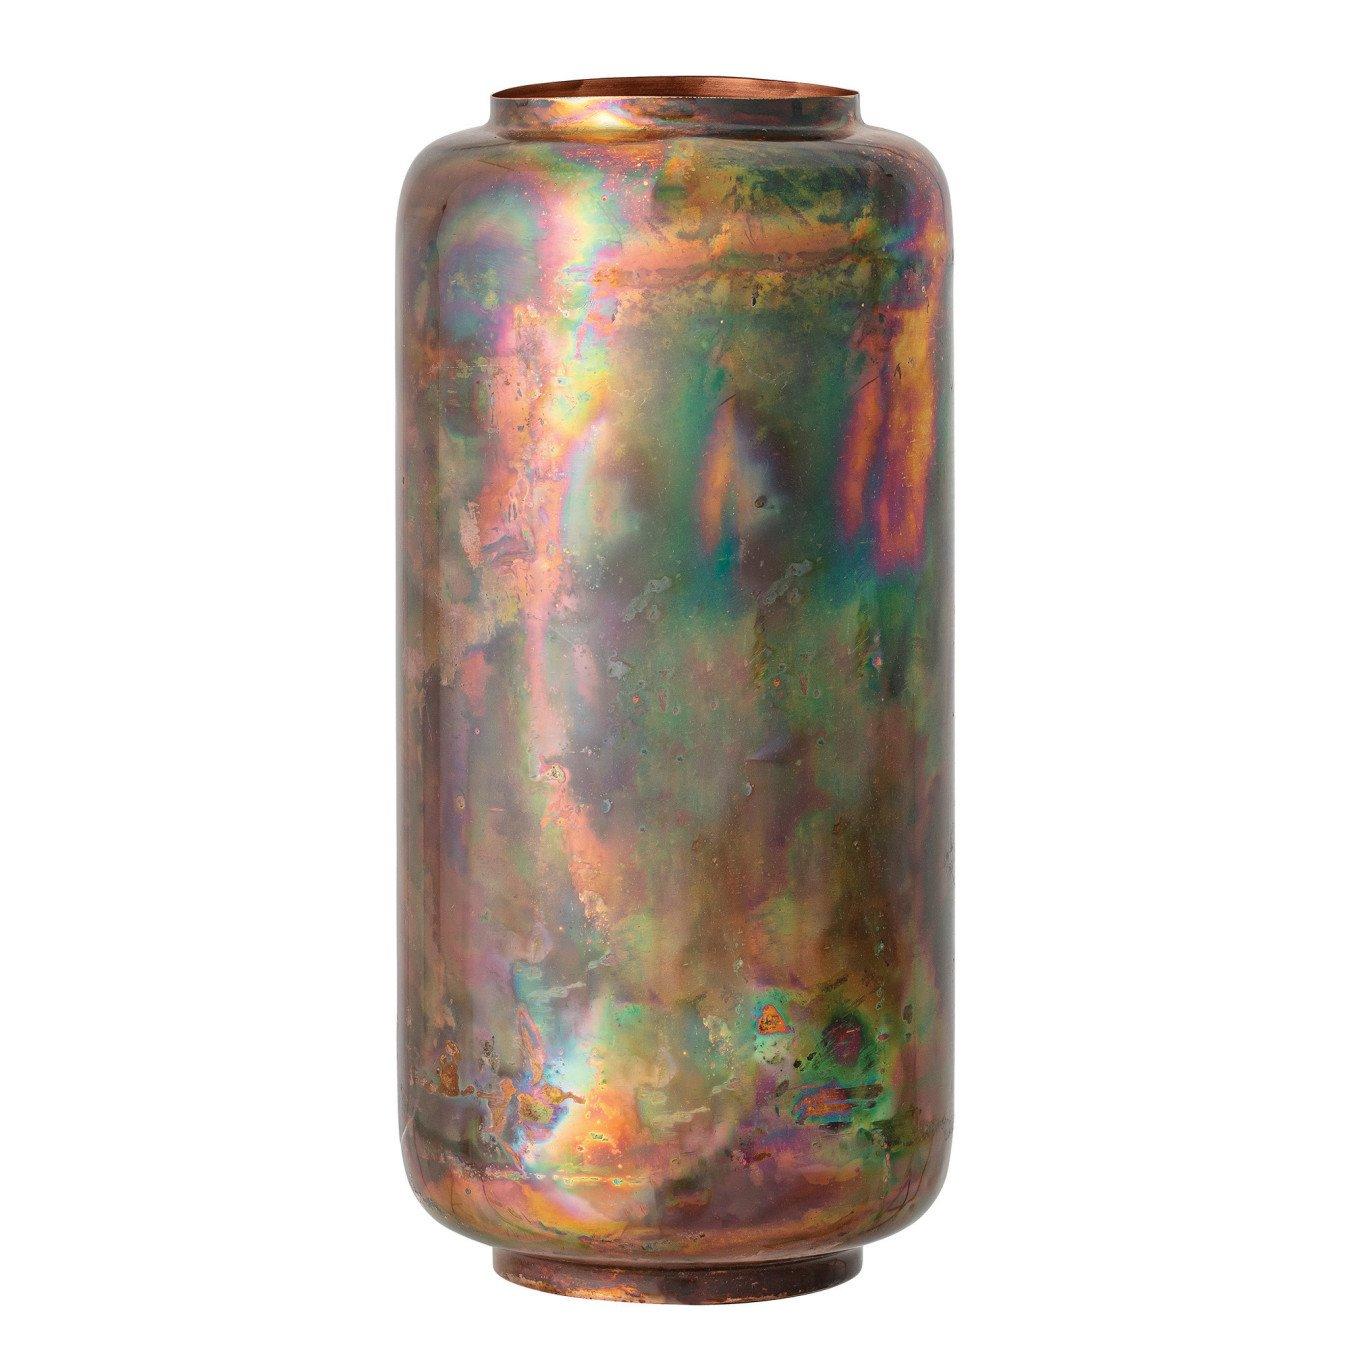 Oxidized Copper Finish Metal Vase